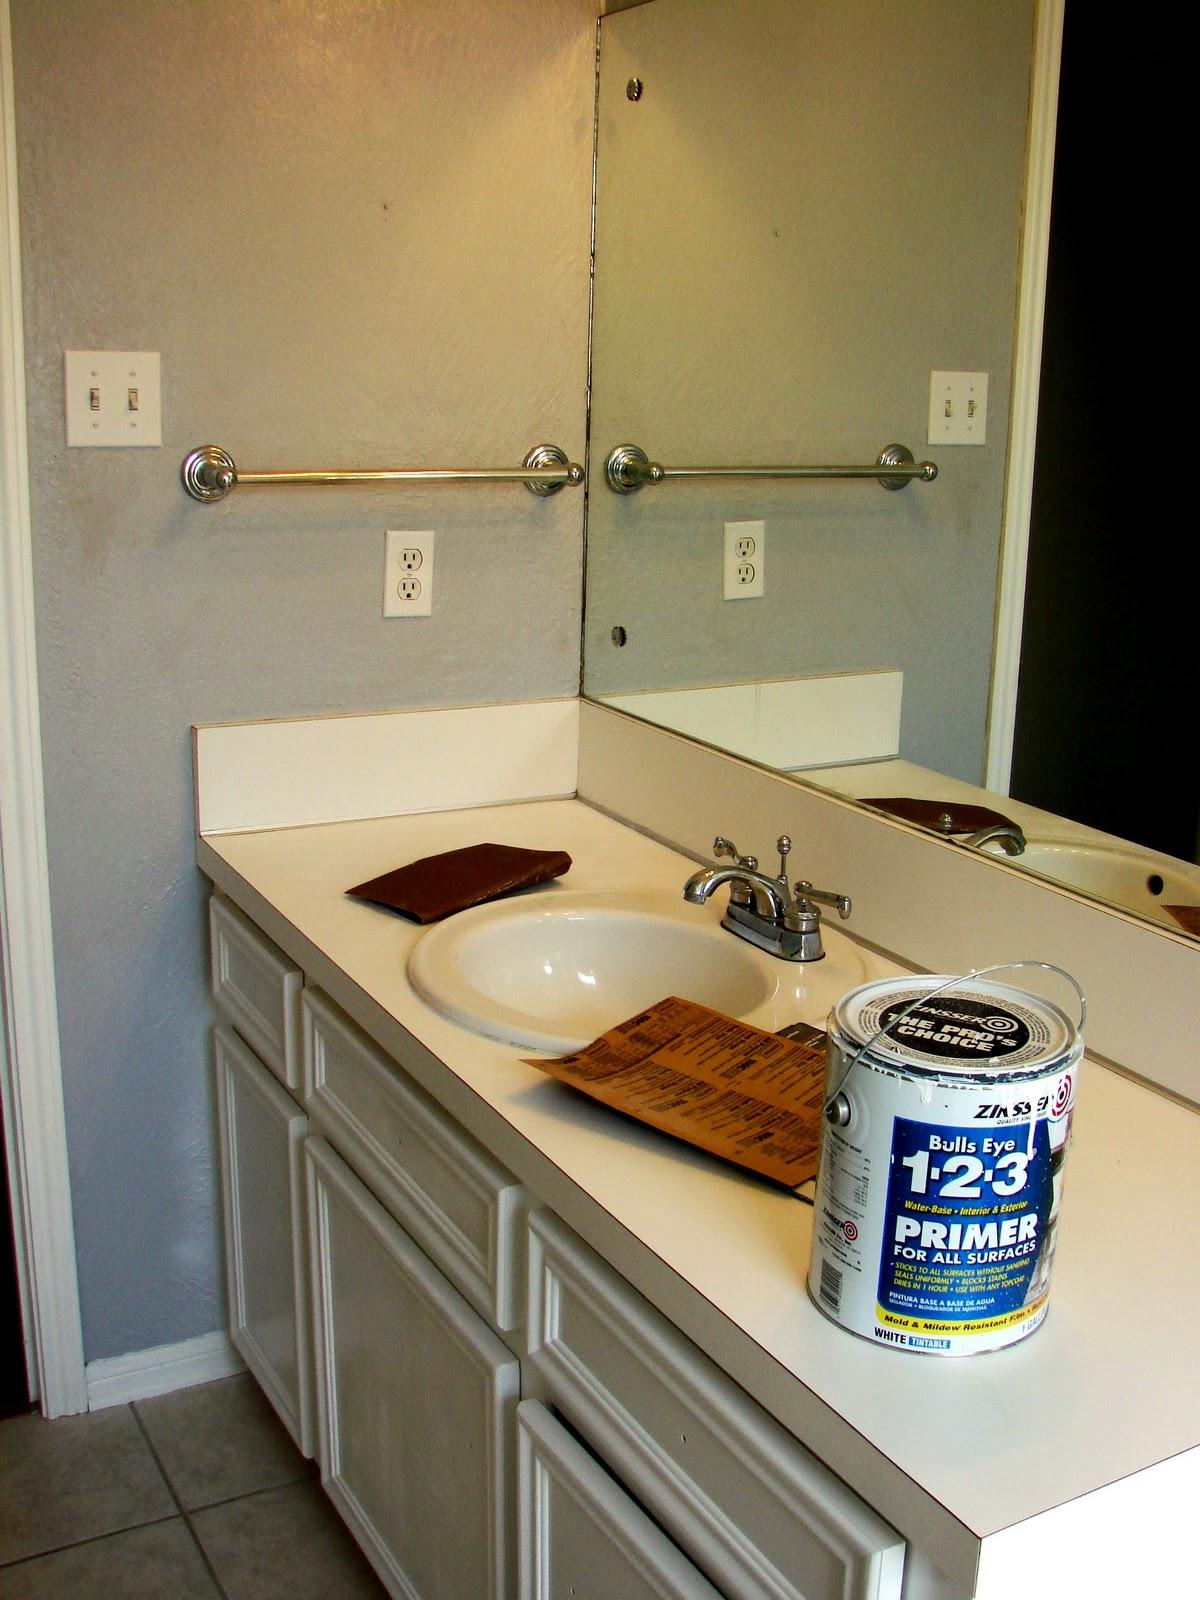 Imperfect Treasures Spray Painted Bathroom Countertop